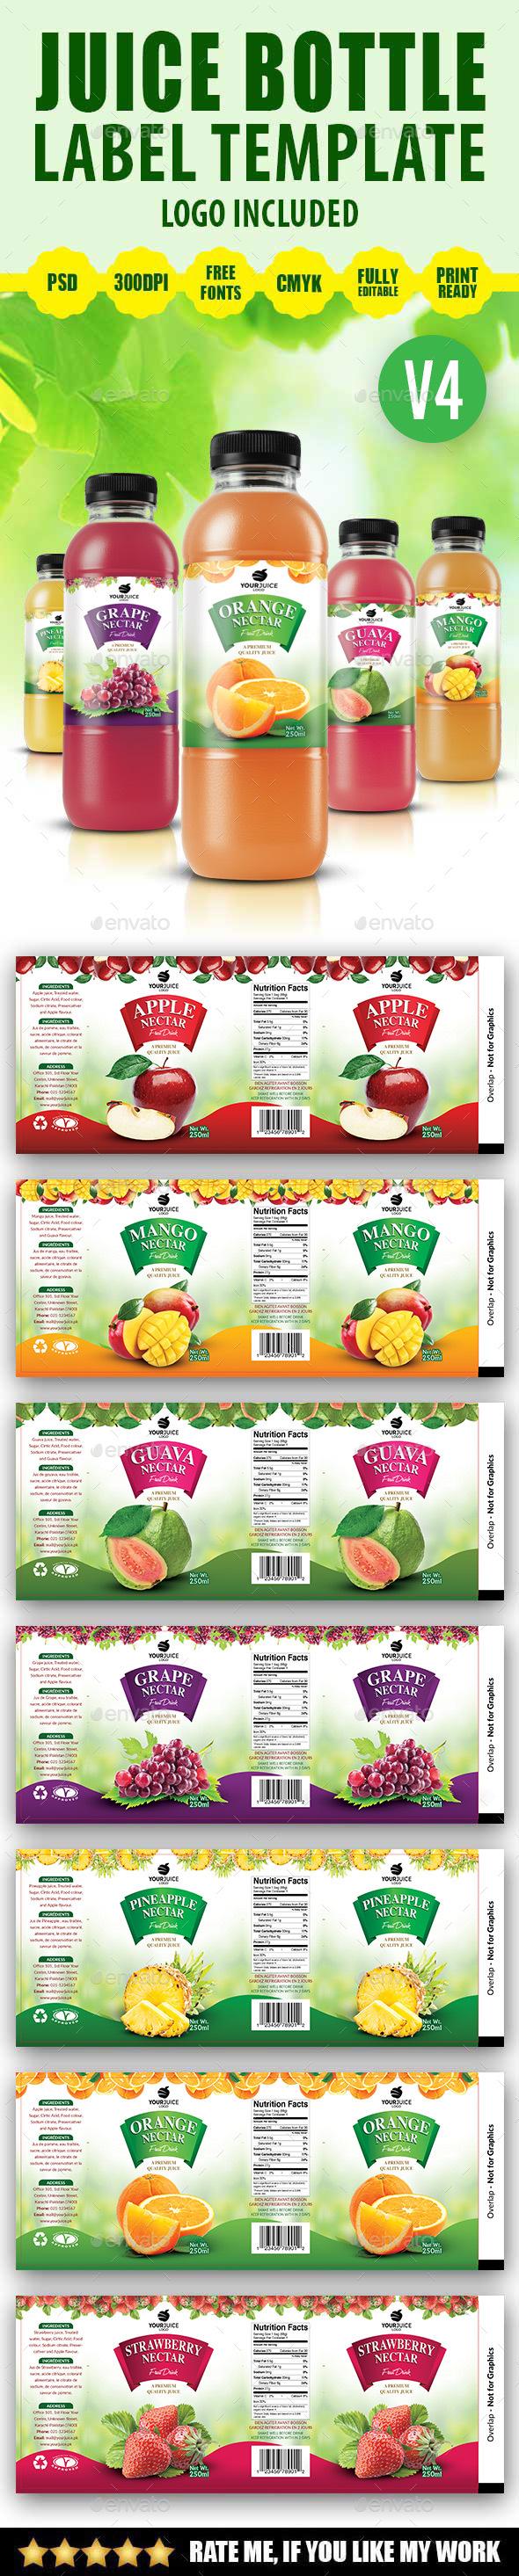 Juice Bottle Label Template V4 - Print Templates